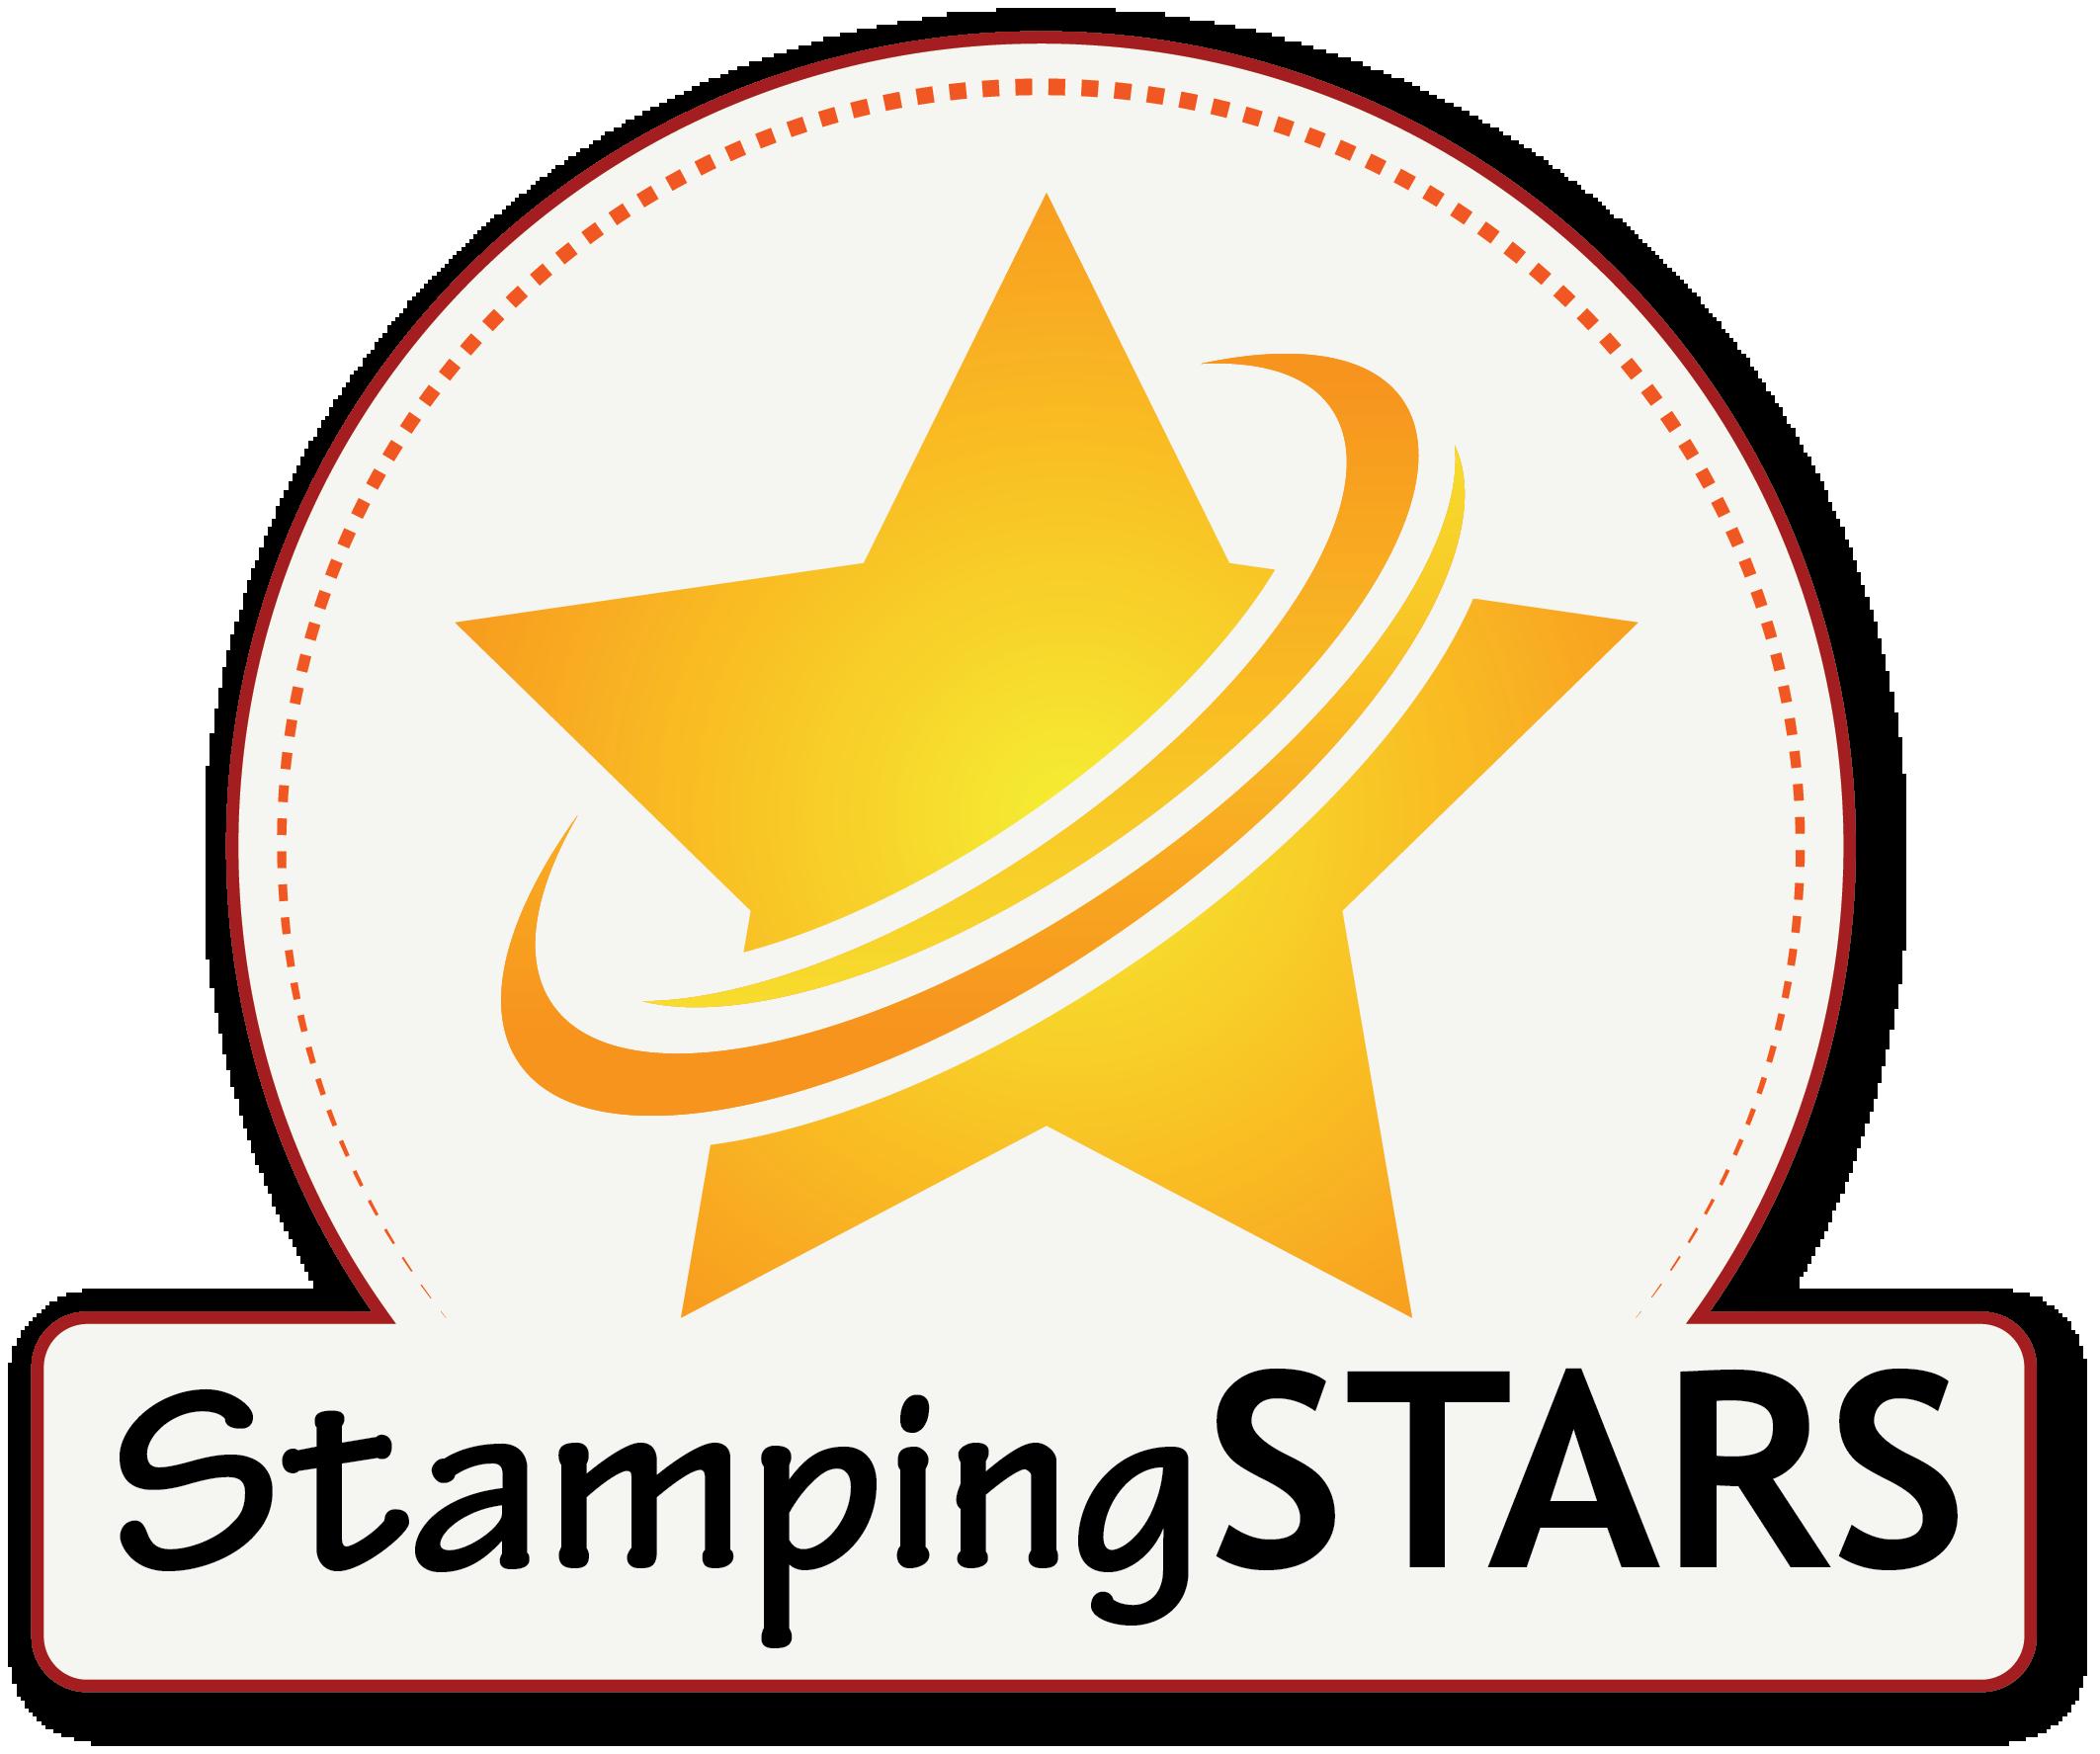 StampingSTARS